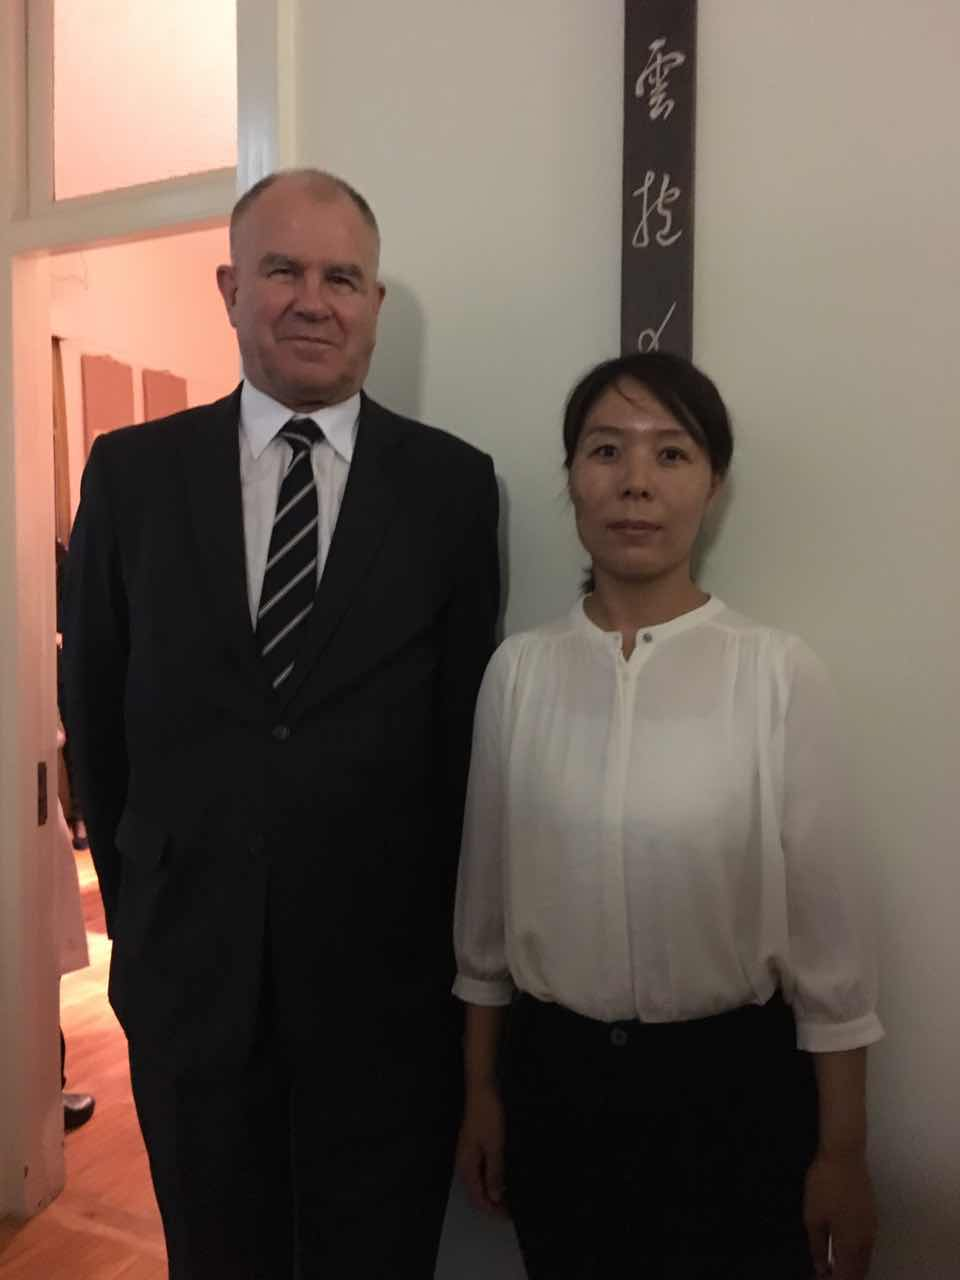 Zelanian Ambassador H.E. Mr. John Mckinnon and Secretary General Cui Jianghong